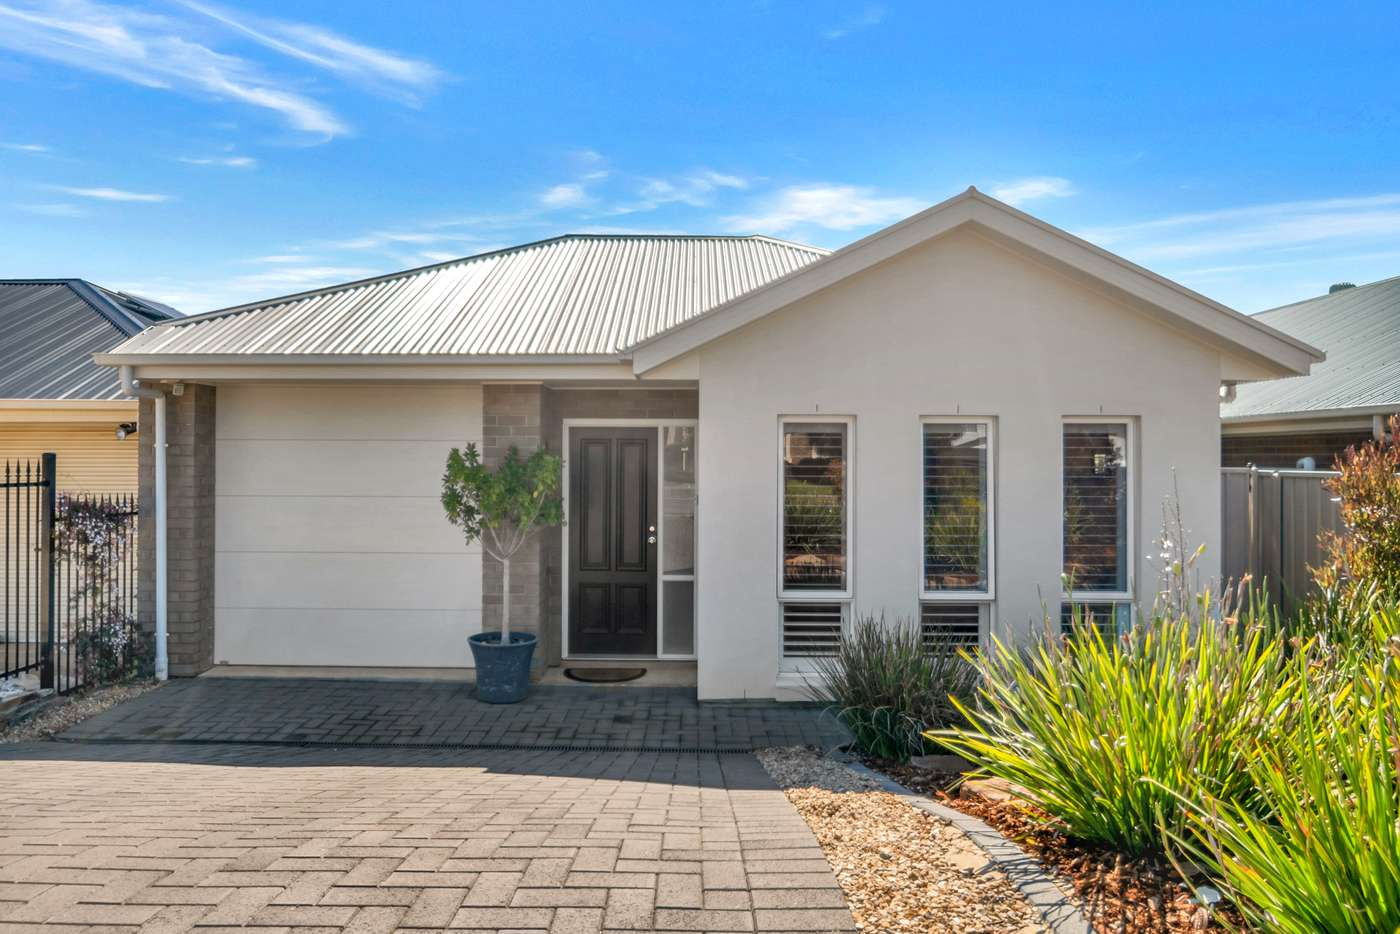 Main view of Homely house listing, 84 Marston Drive, Morphett Vale SA 5162